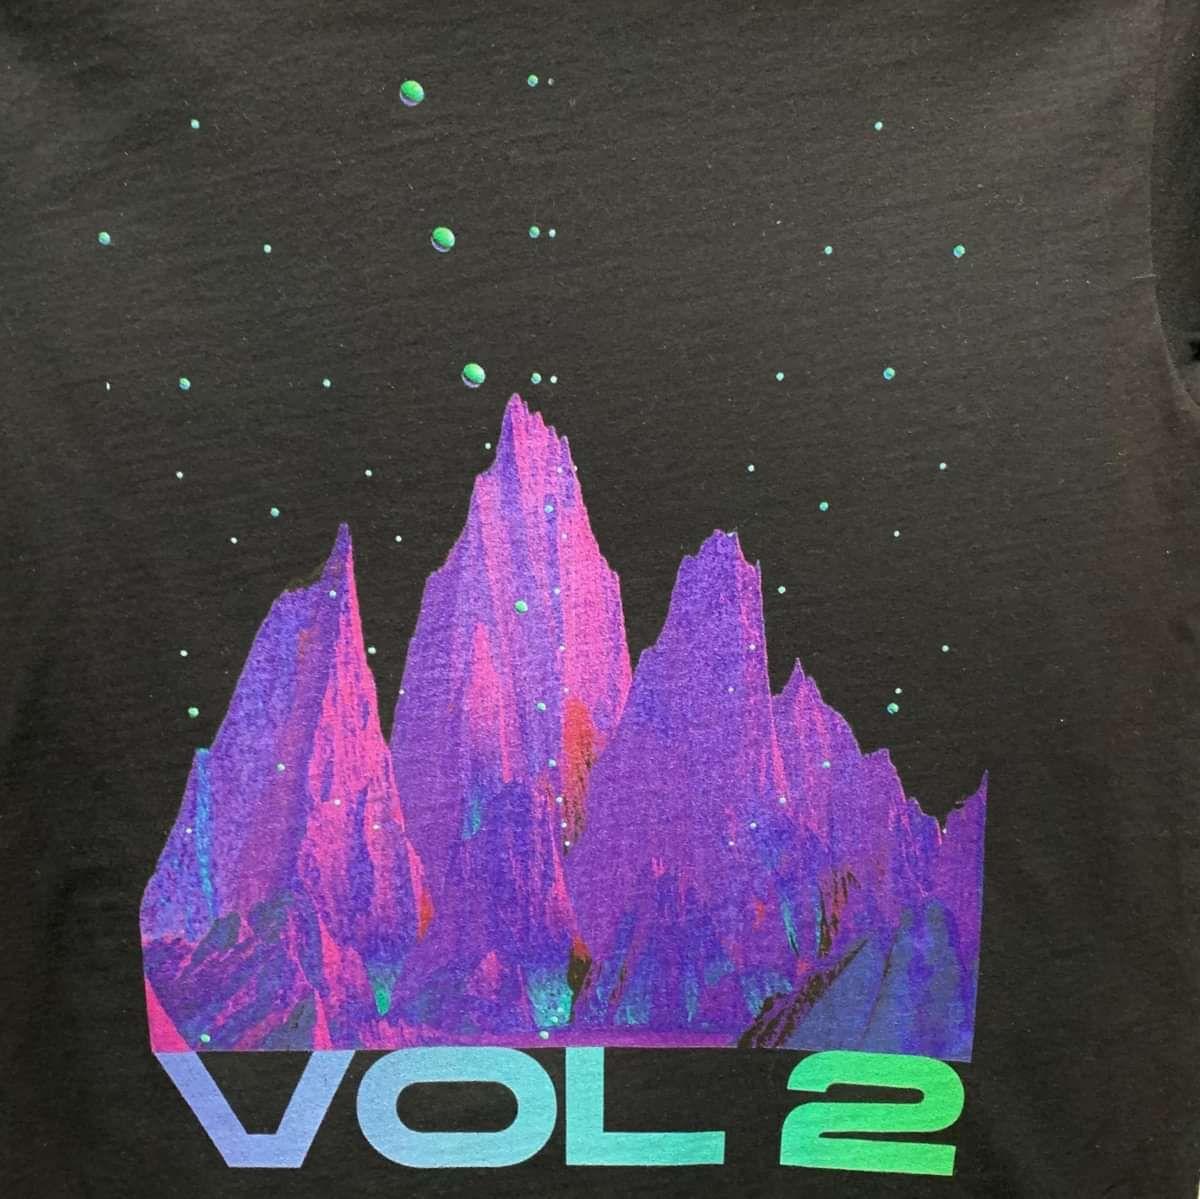 Pure Moons Vol. 2 Long Sleeve T-Shirt - Moon Boots